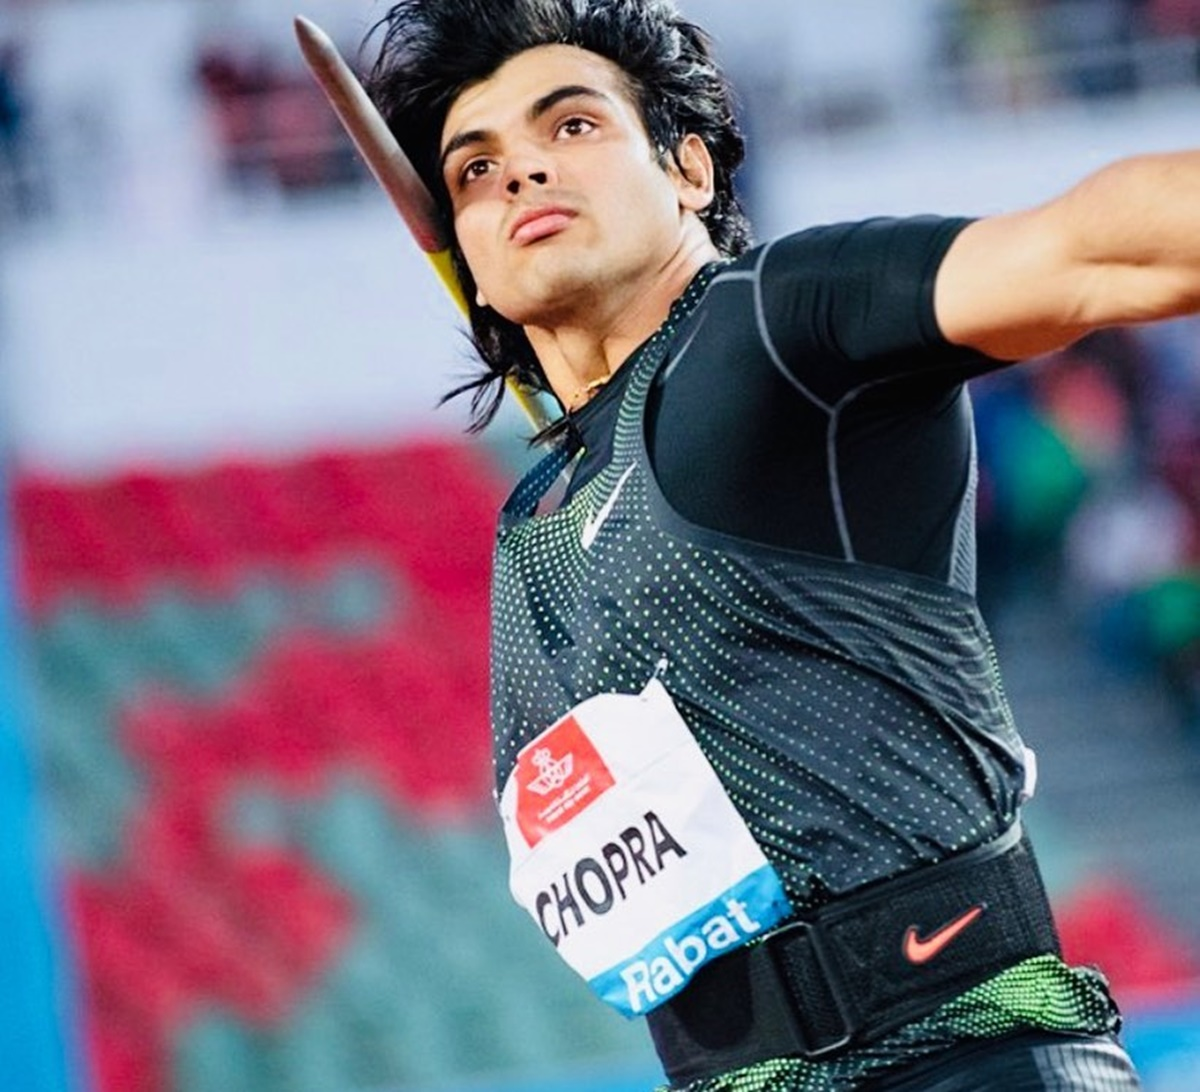 Ahead of Olympics, Neeraj ironing out kinks